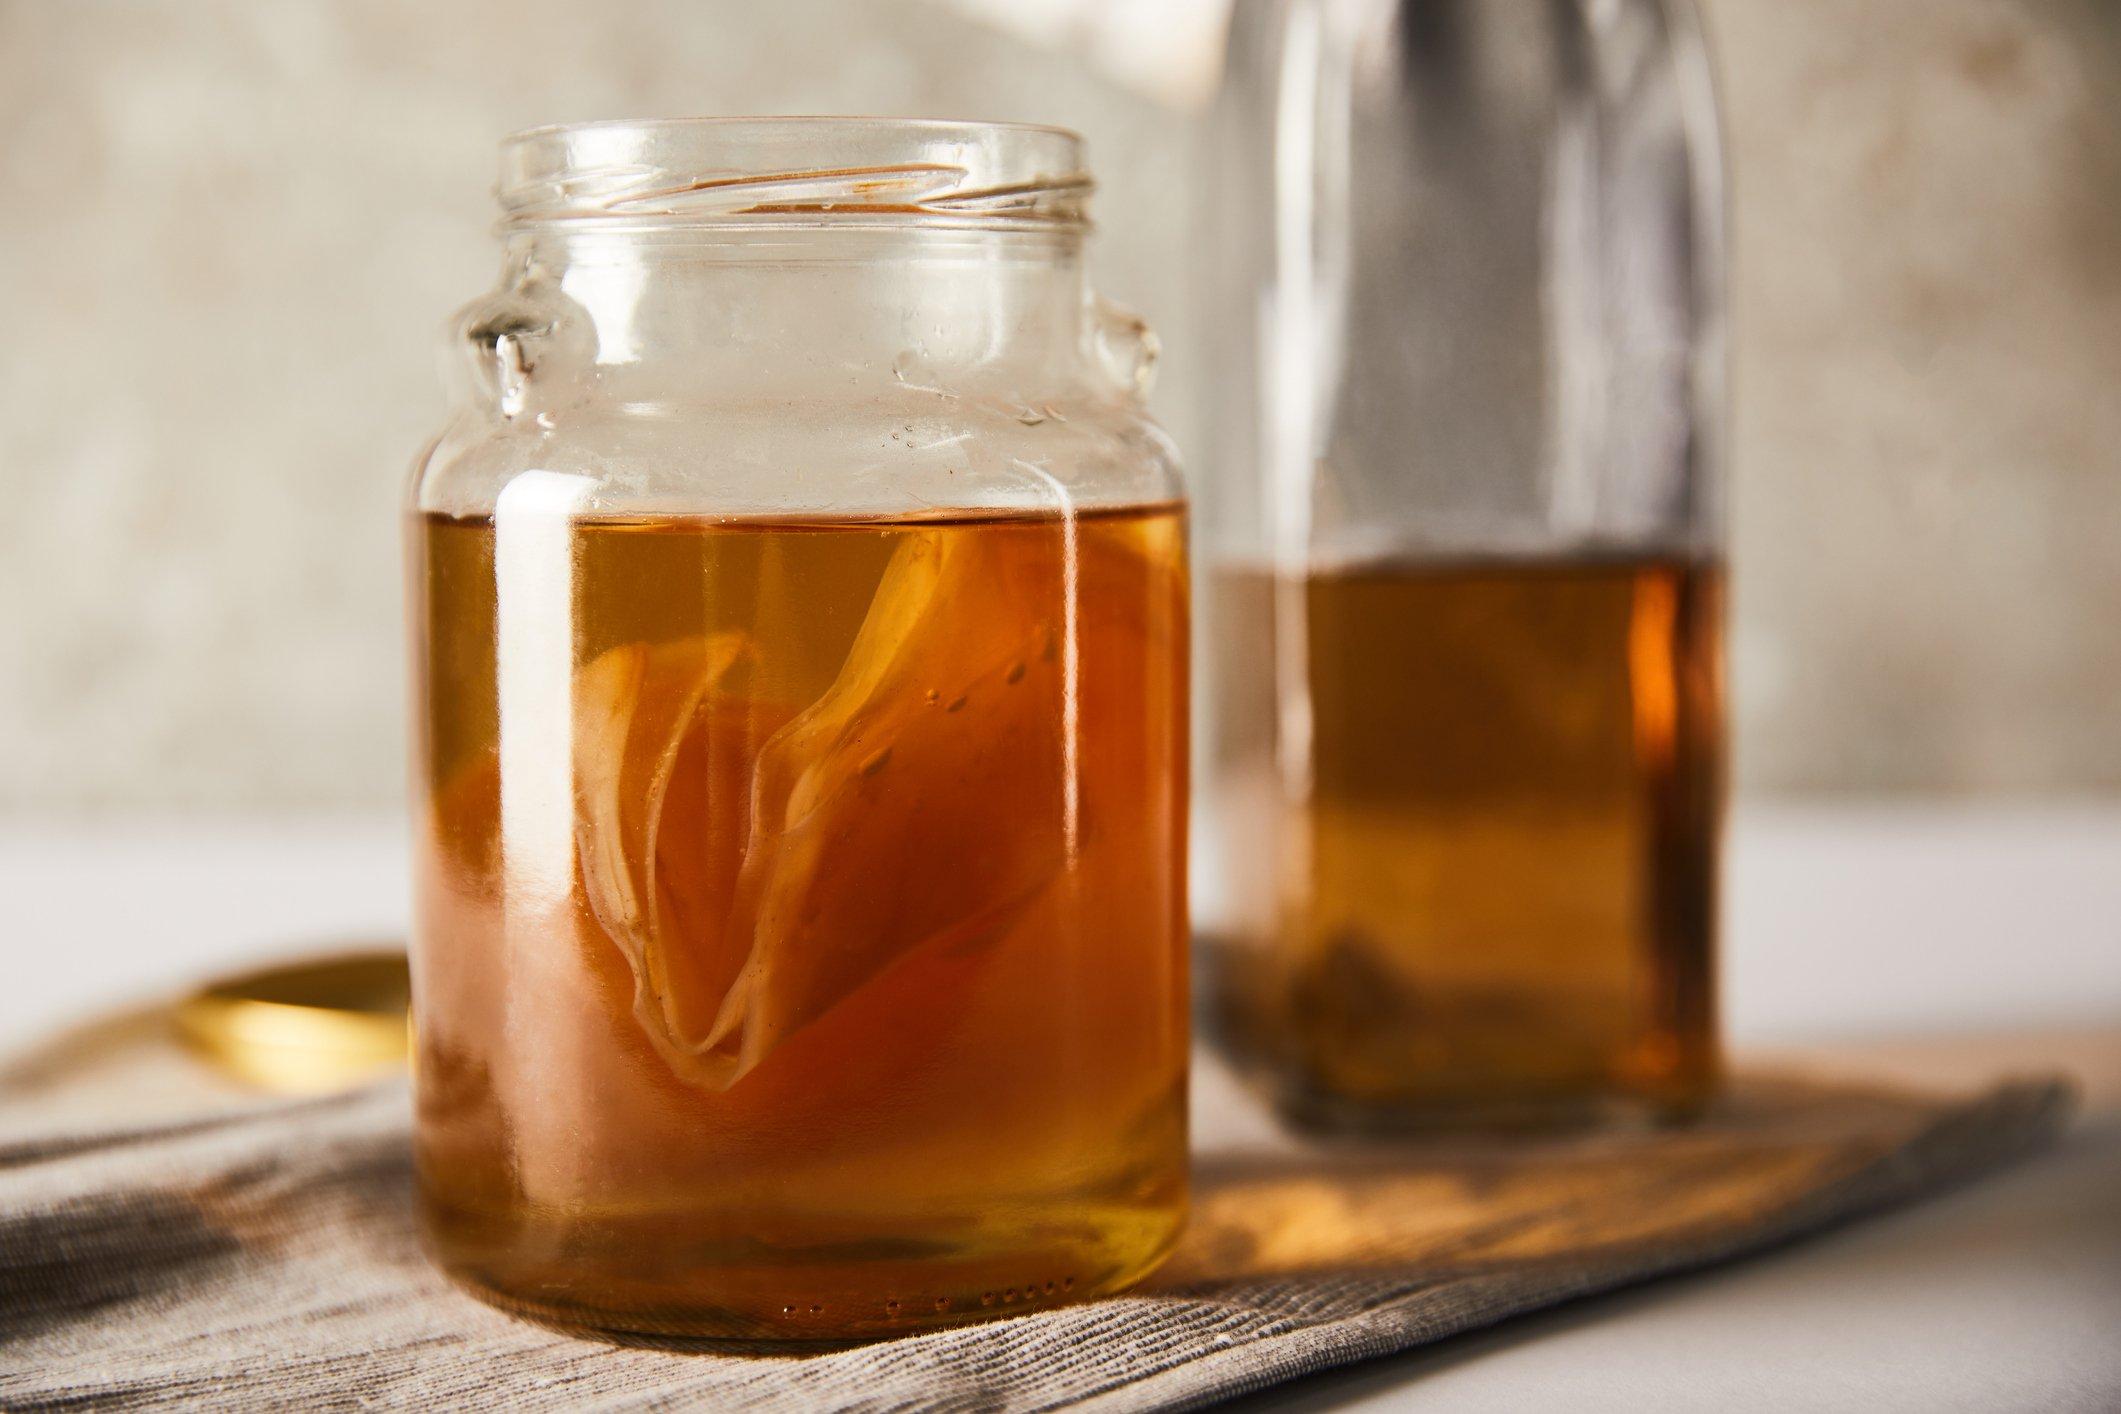 kombucha tea in a jar